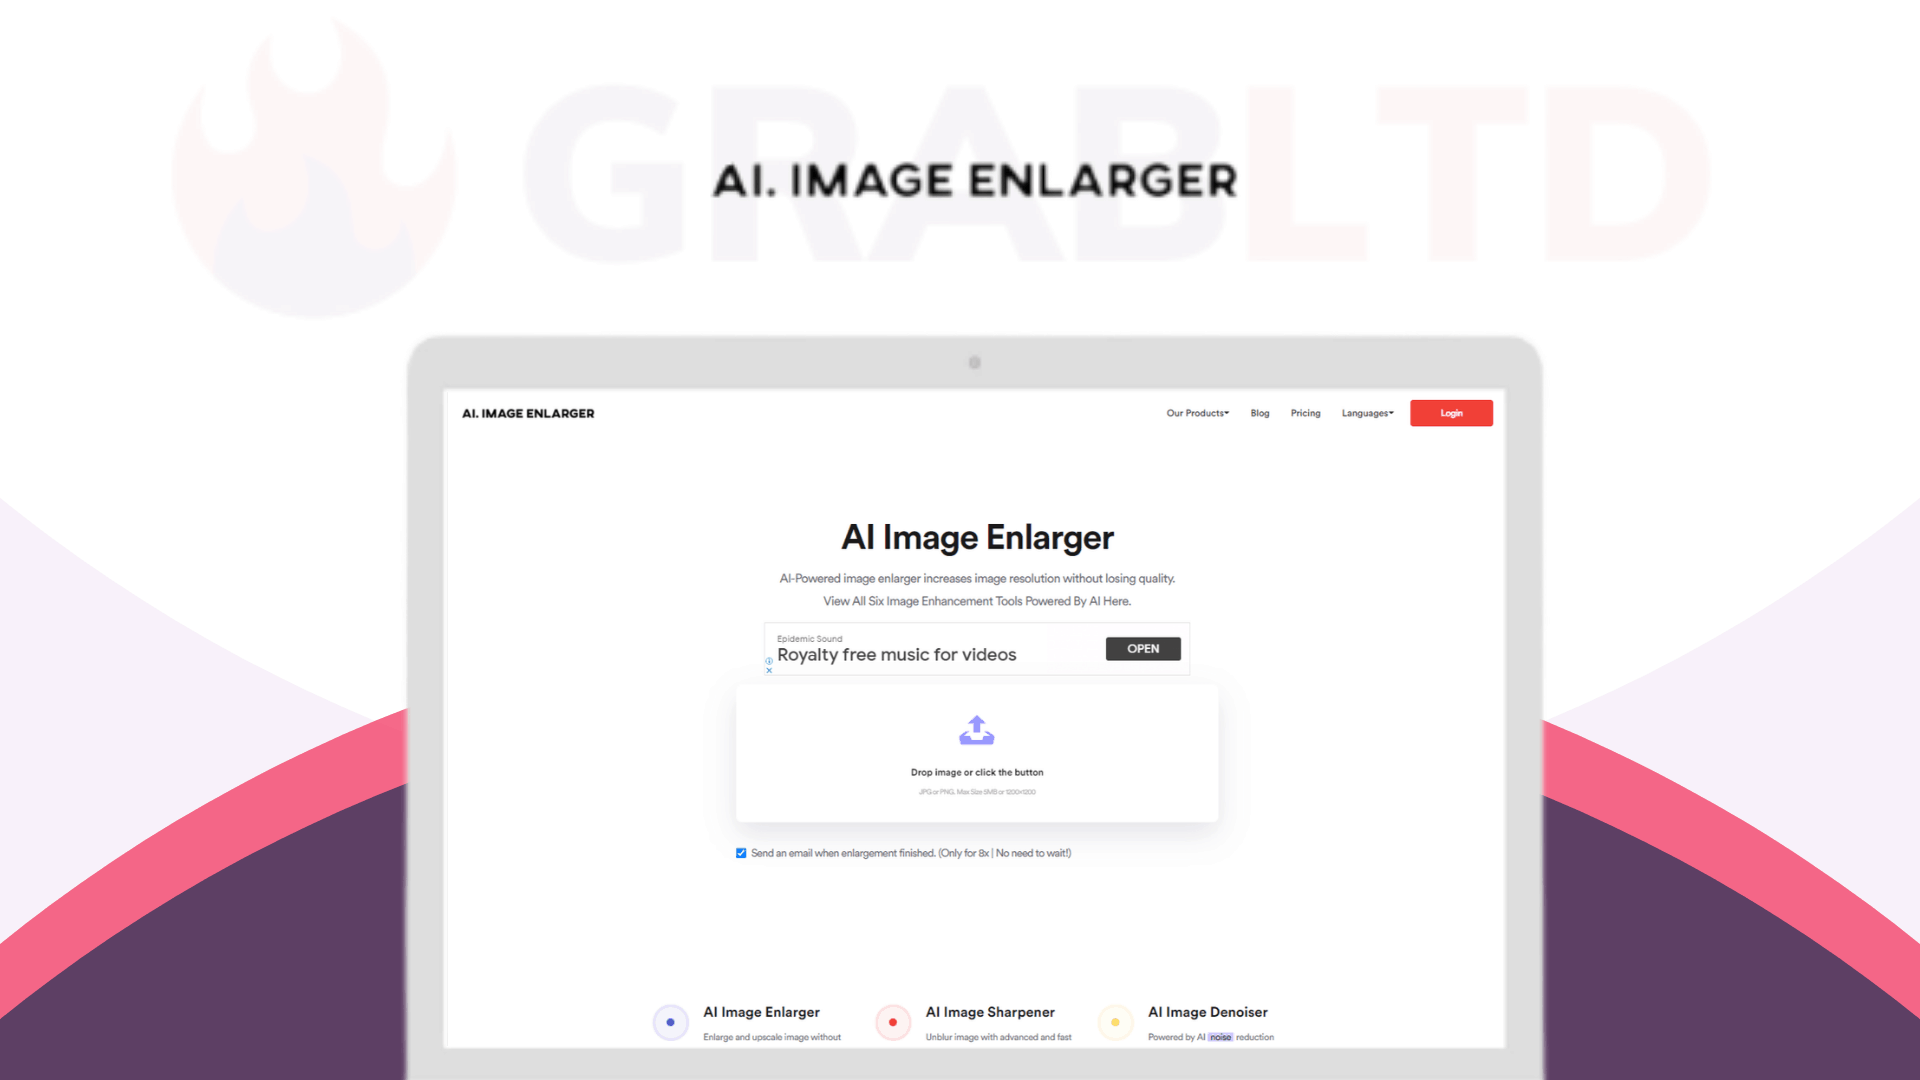 AI Image Enlarger | AI-powered Image Editing Software 1